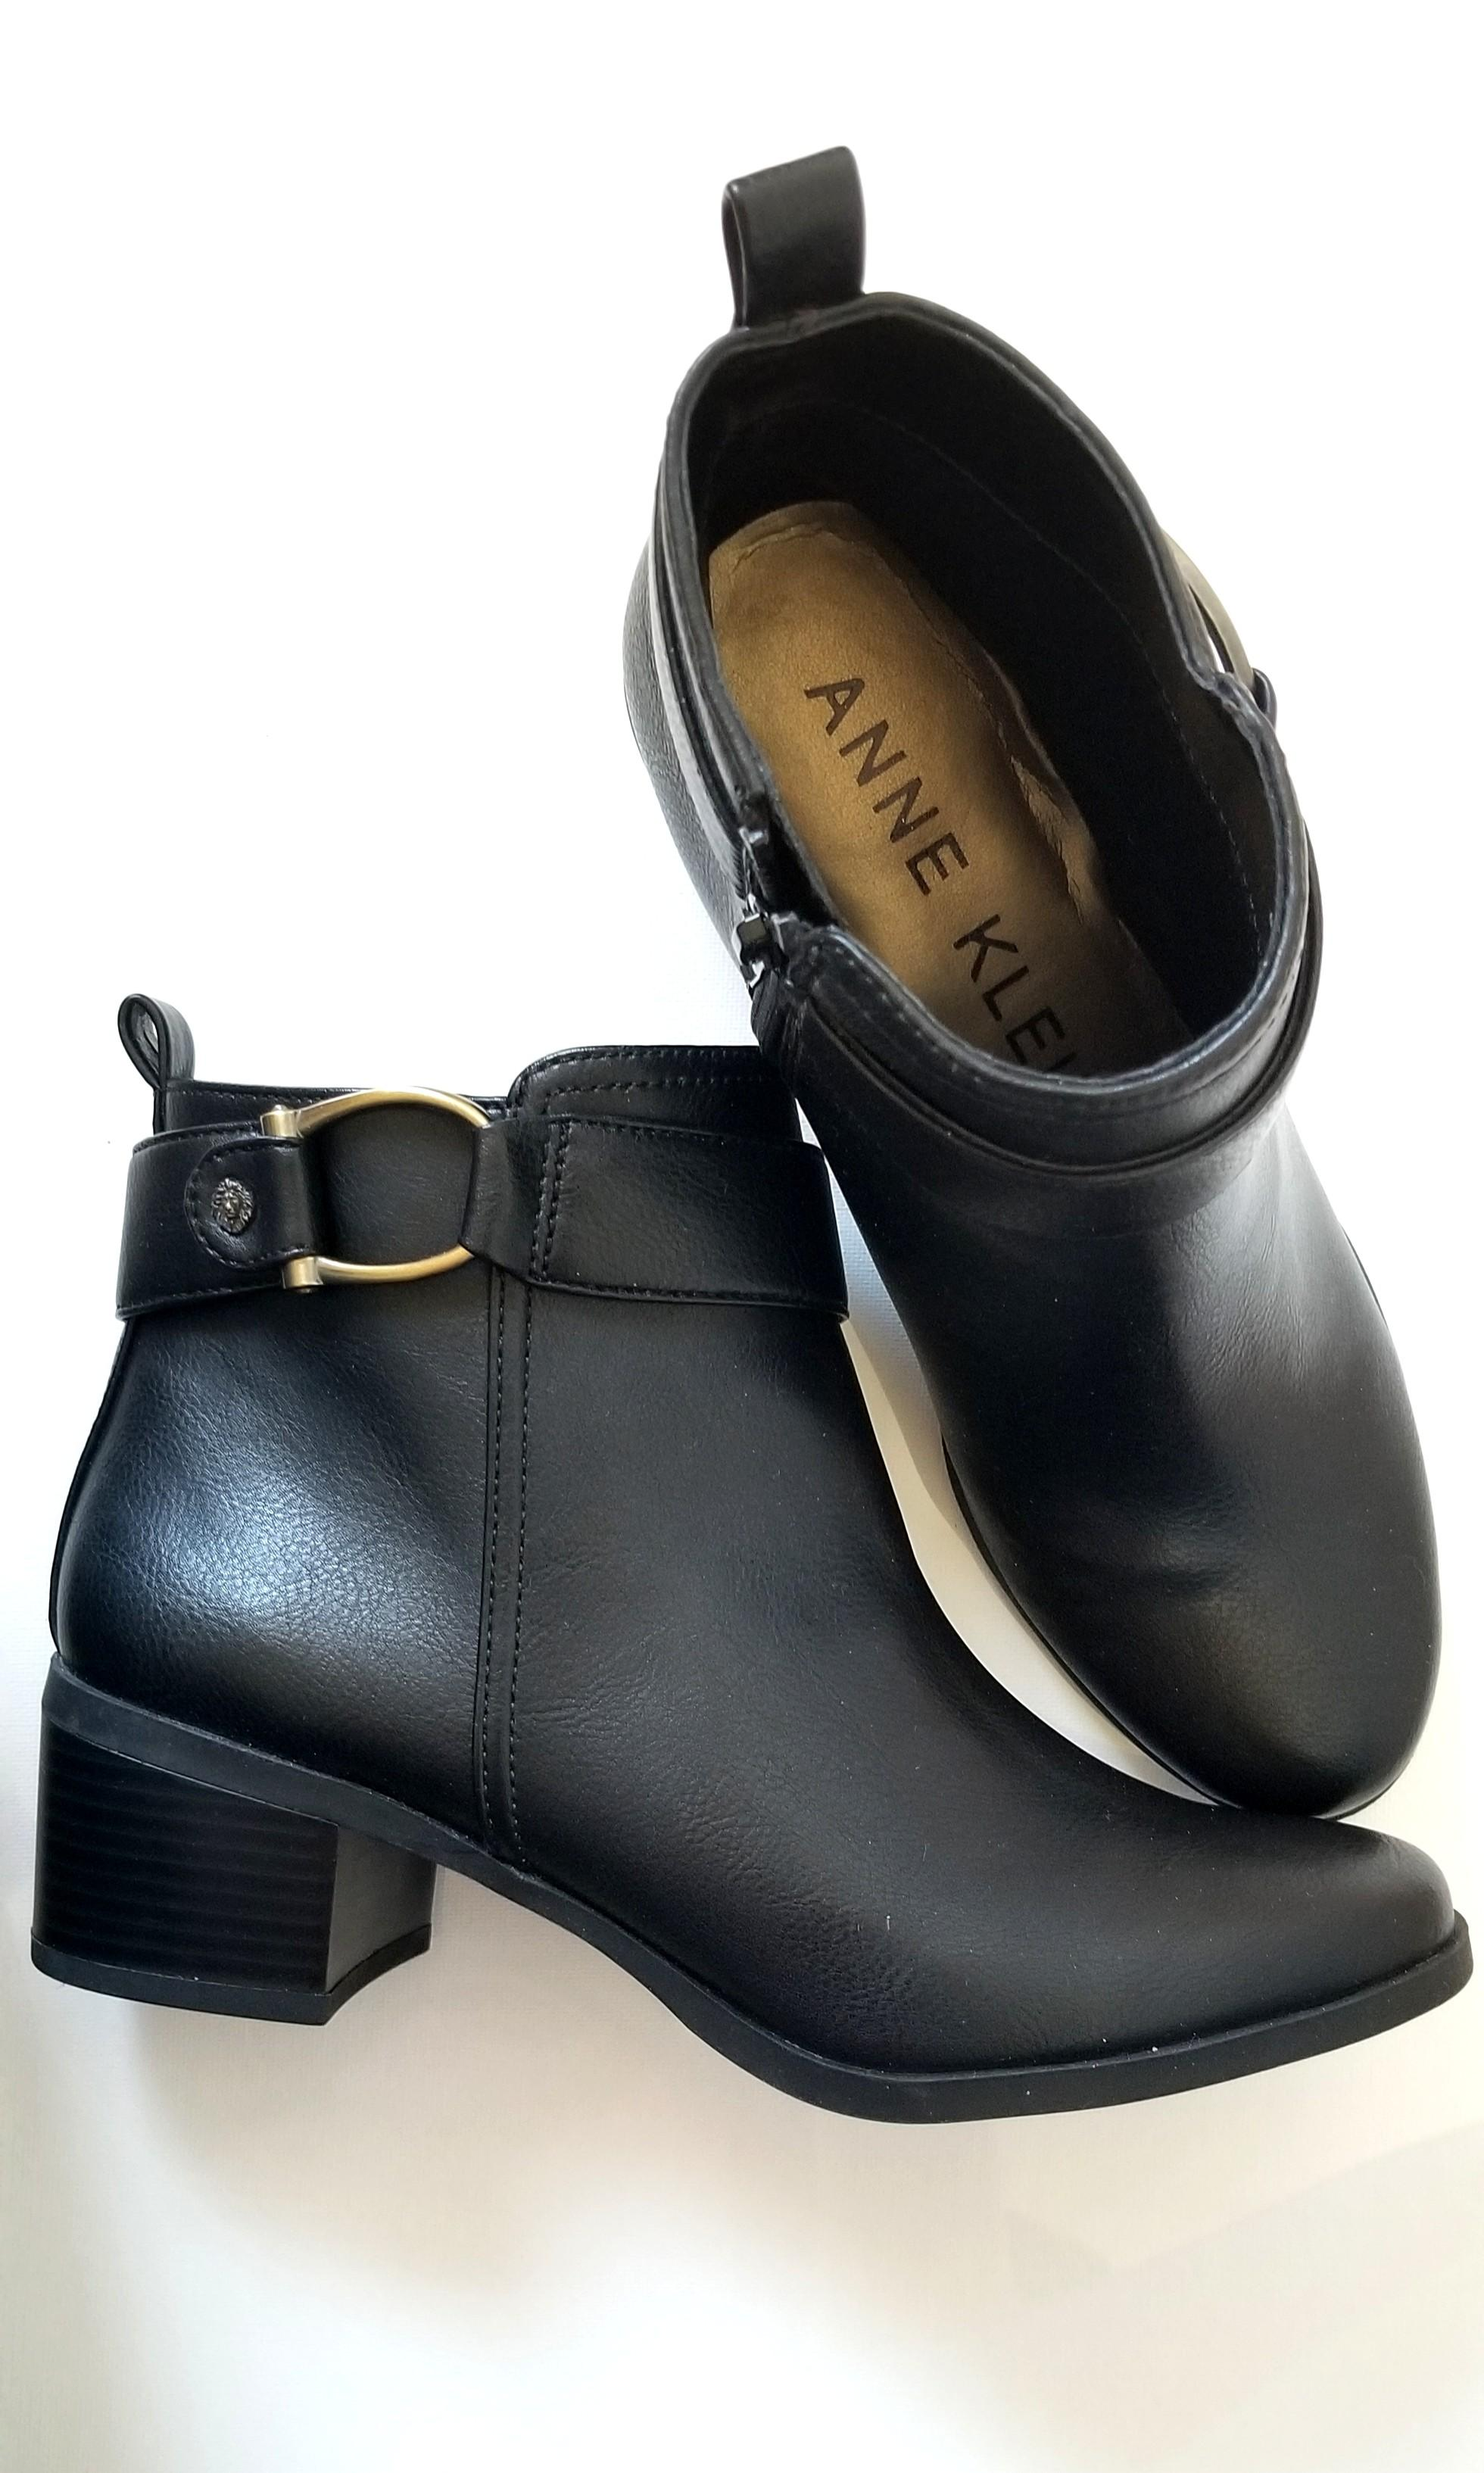 Anne Klein heeled booties size 6